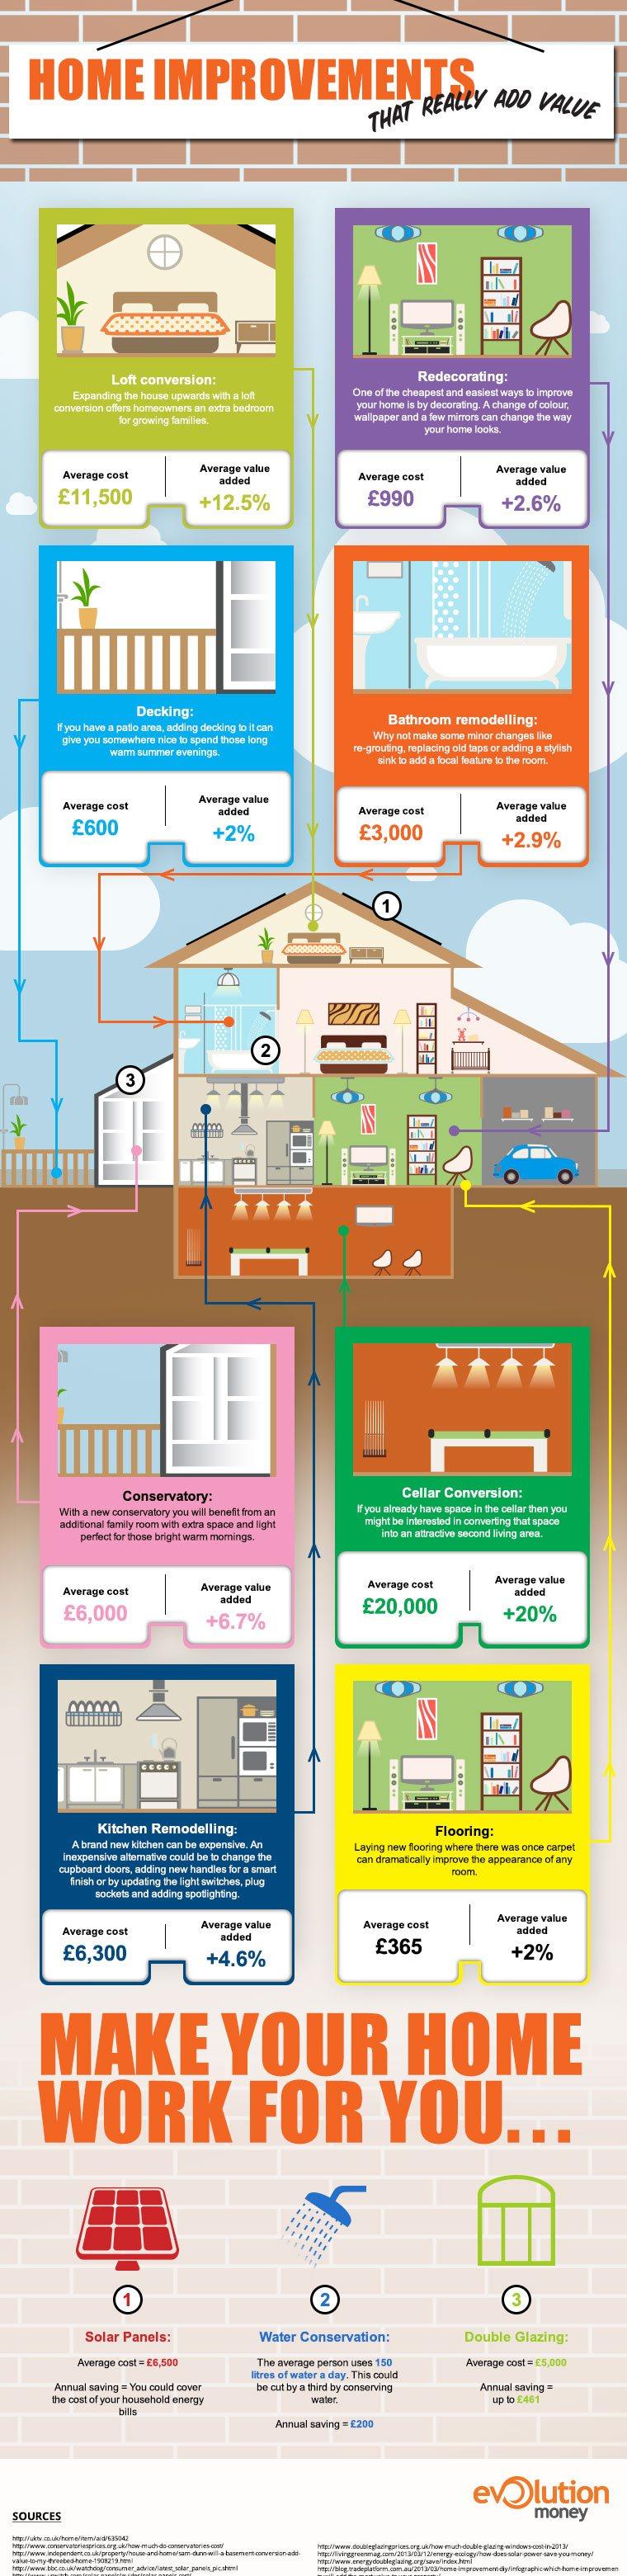 Evolution Money's infographic into home improvements